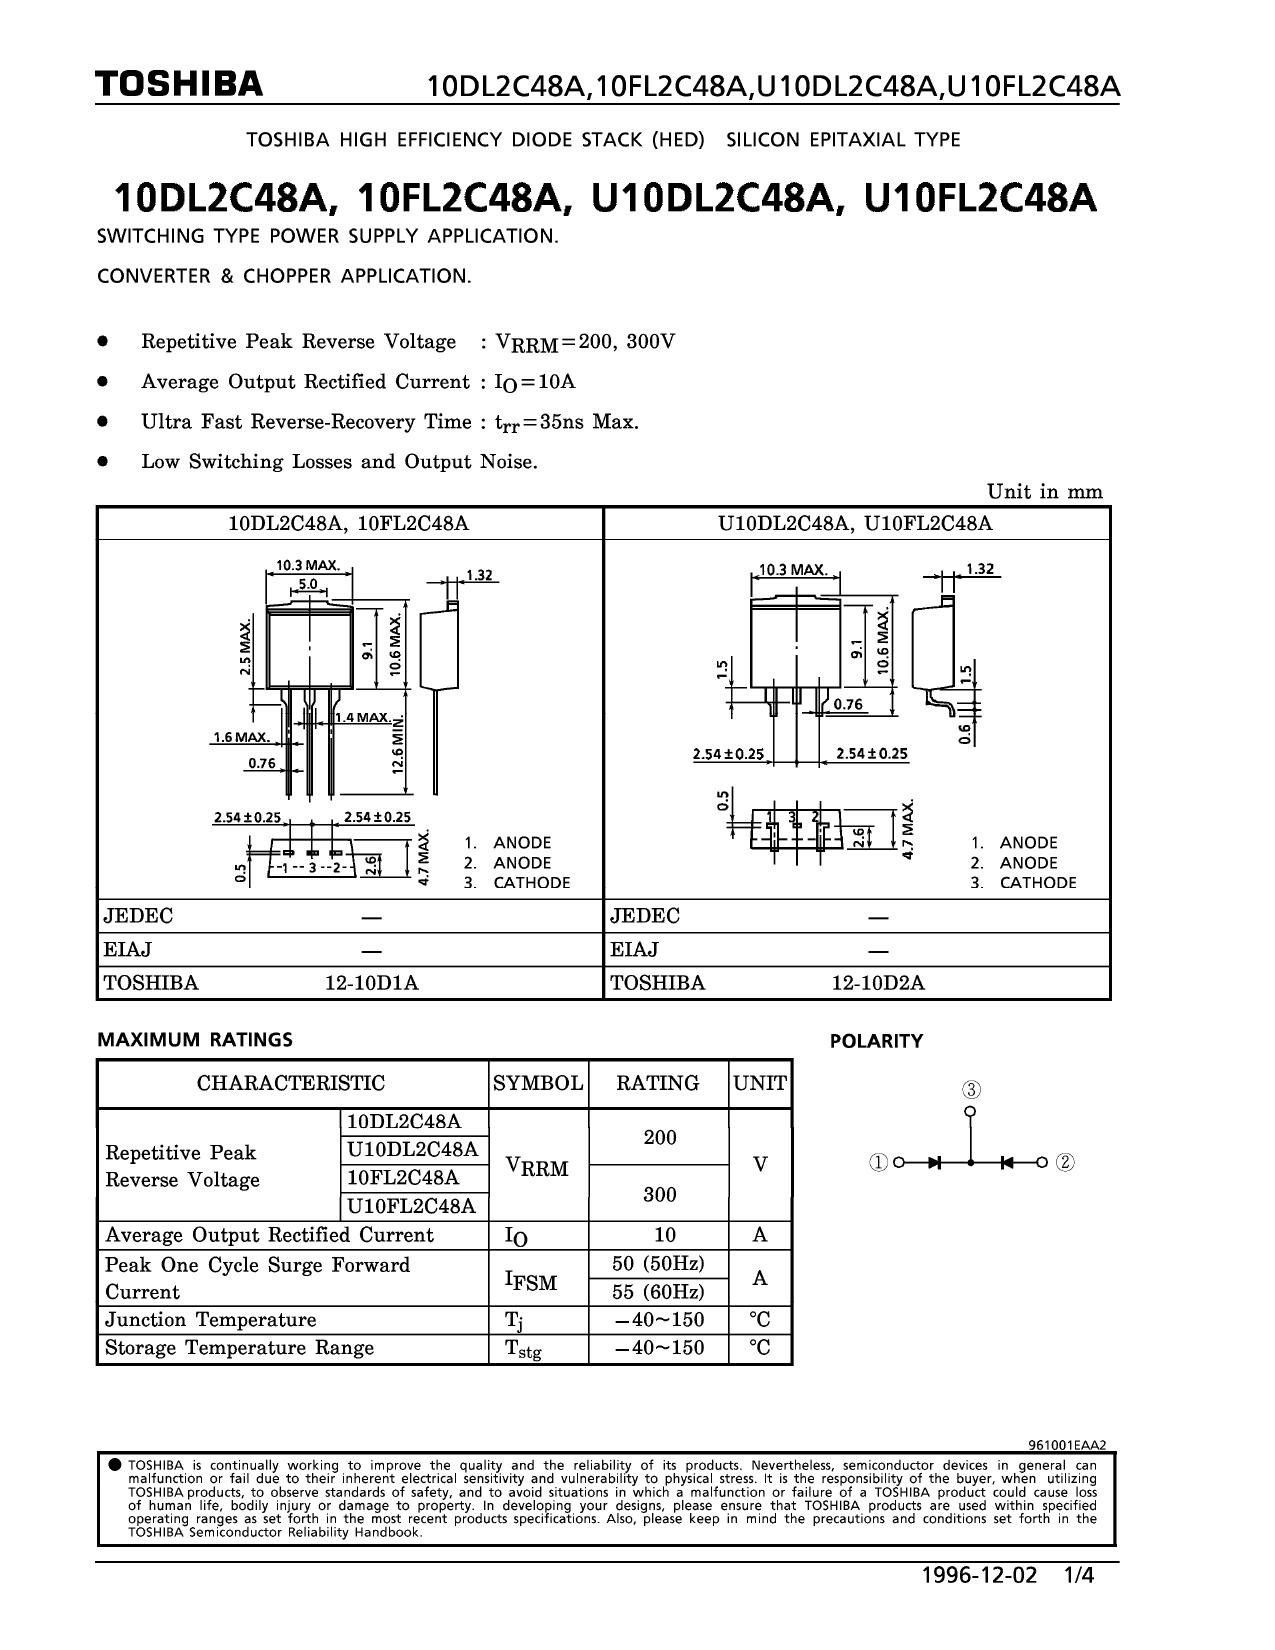 U10DL2C48A دیتاشیت PDF